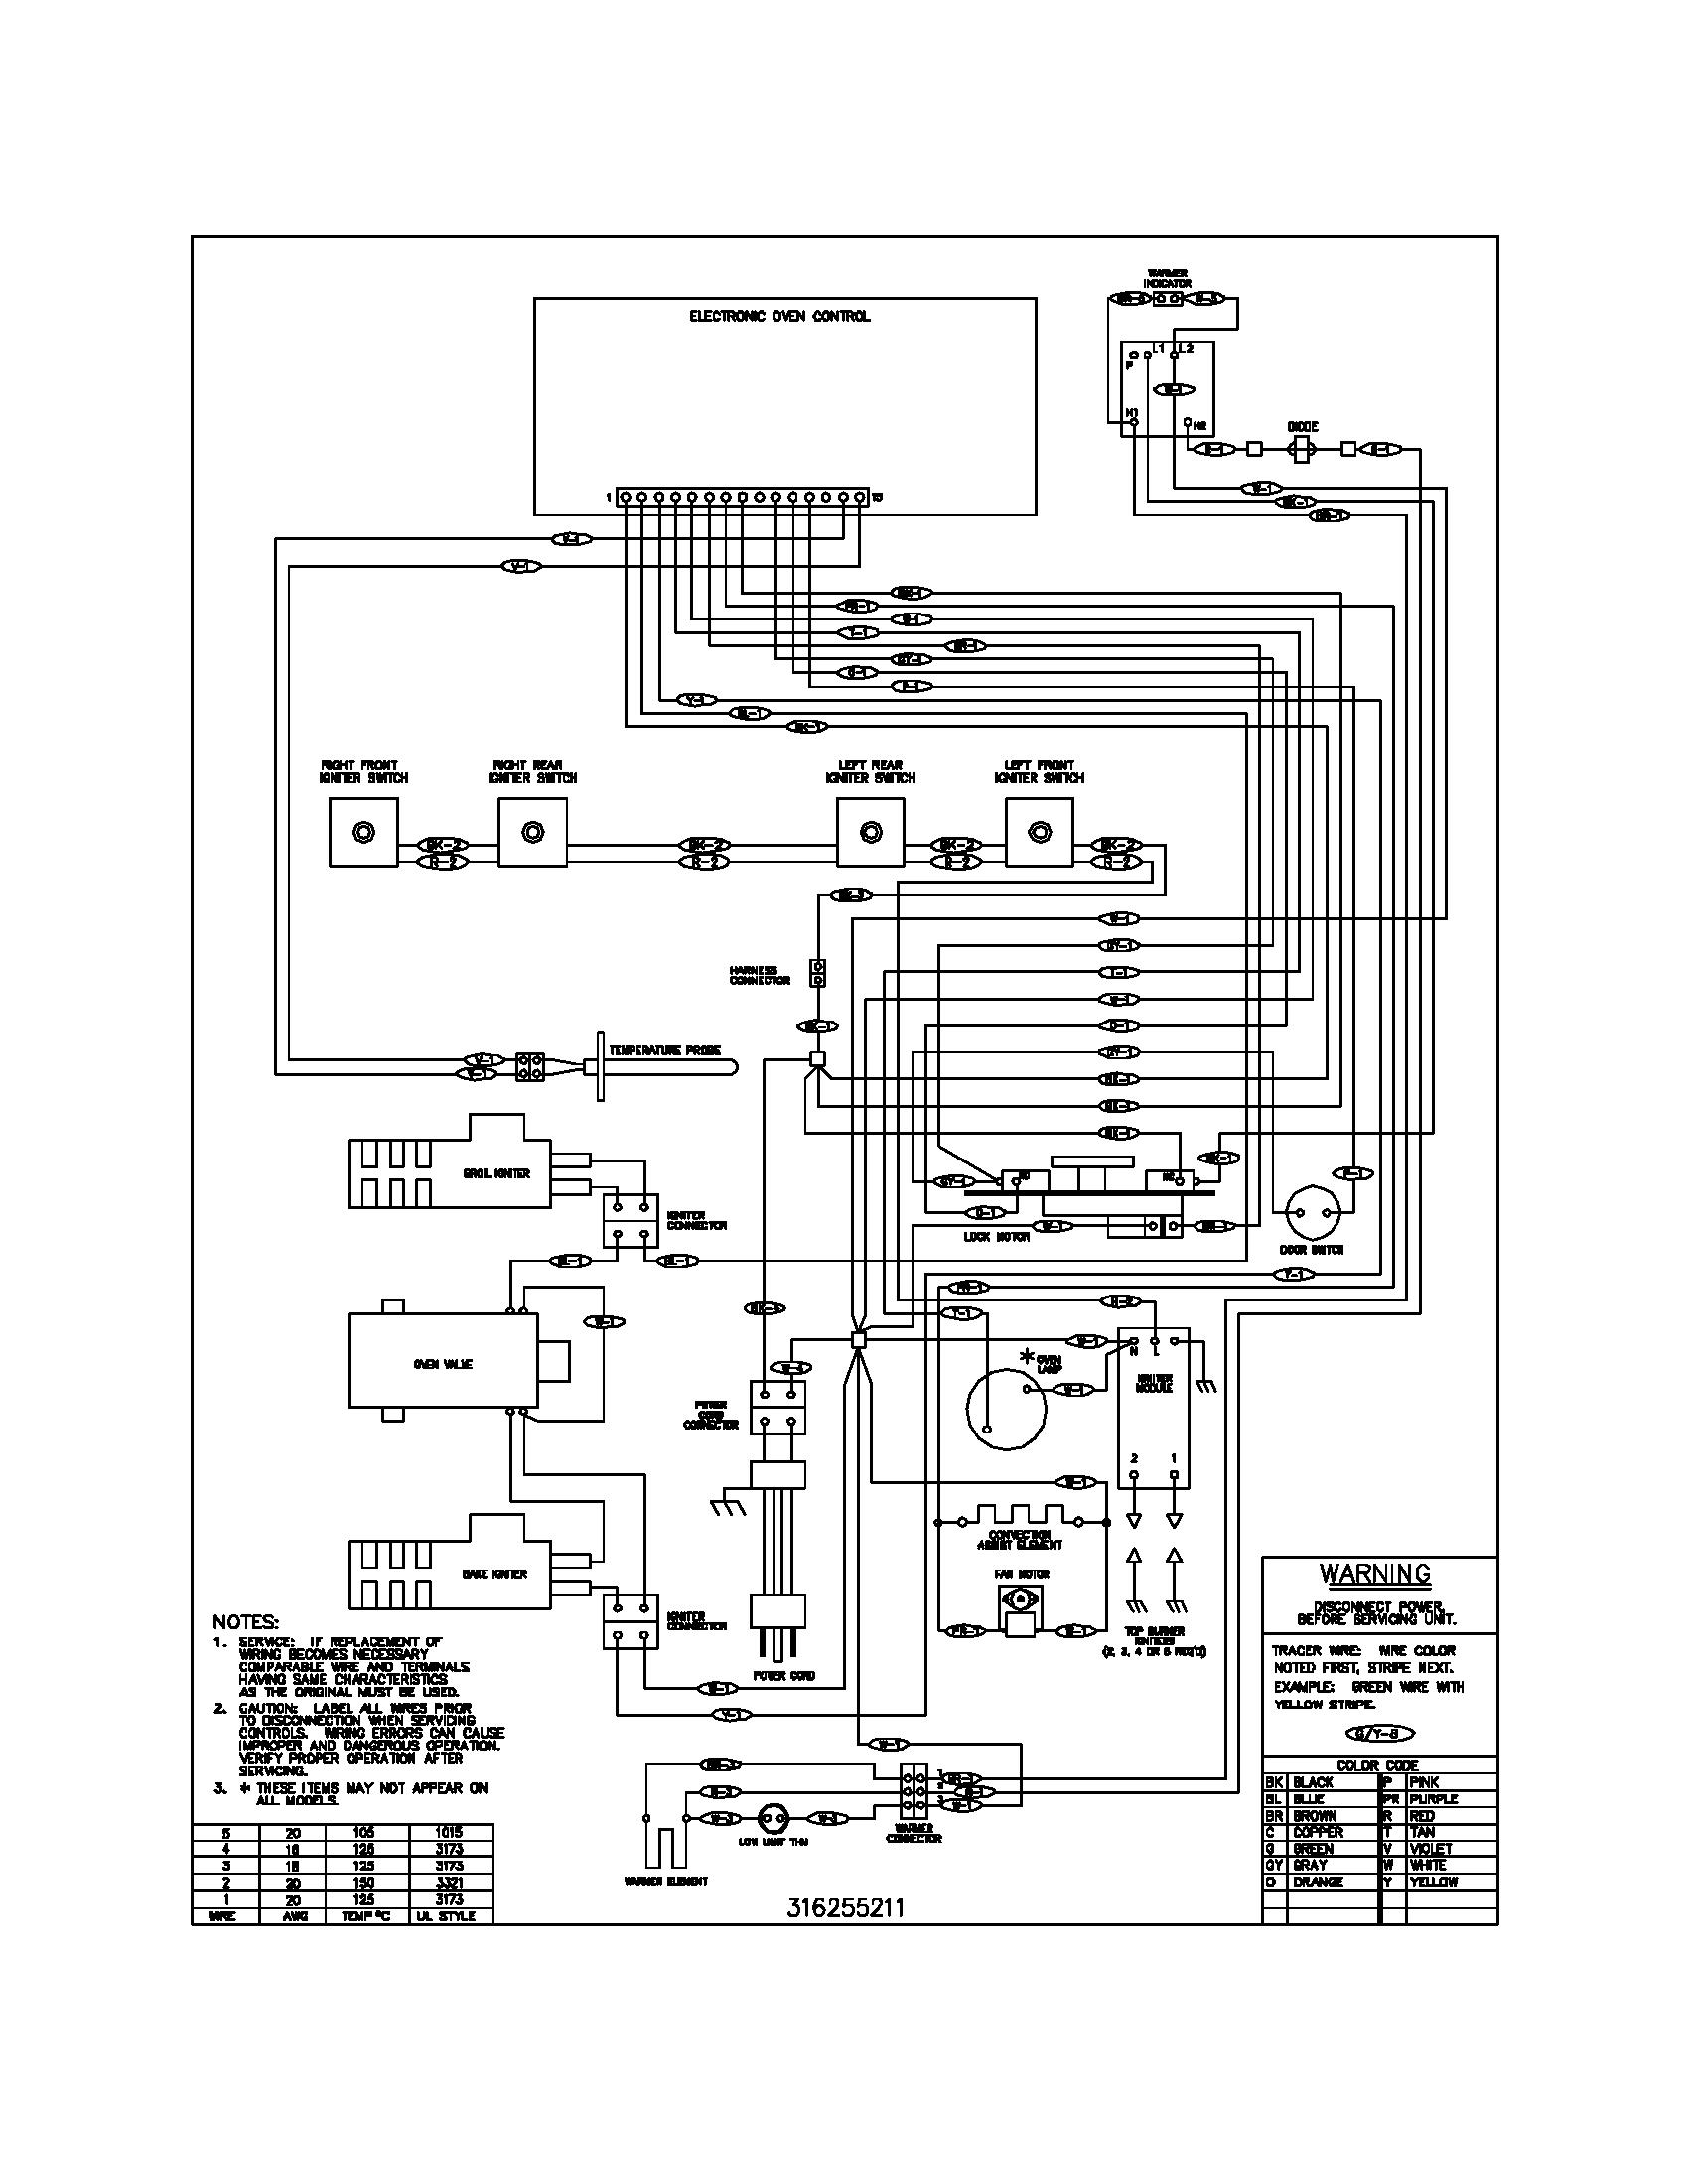 Wiring Diagram Car Wash Diagram Diagramtemplate Diagramsample Check More At Https Servisi Co Wiring Diagram Car Wash Diagram Diagram Chart Timer